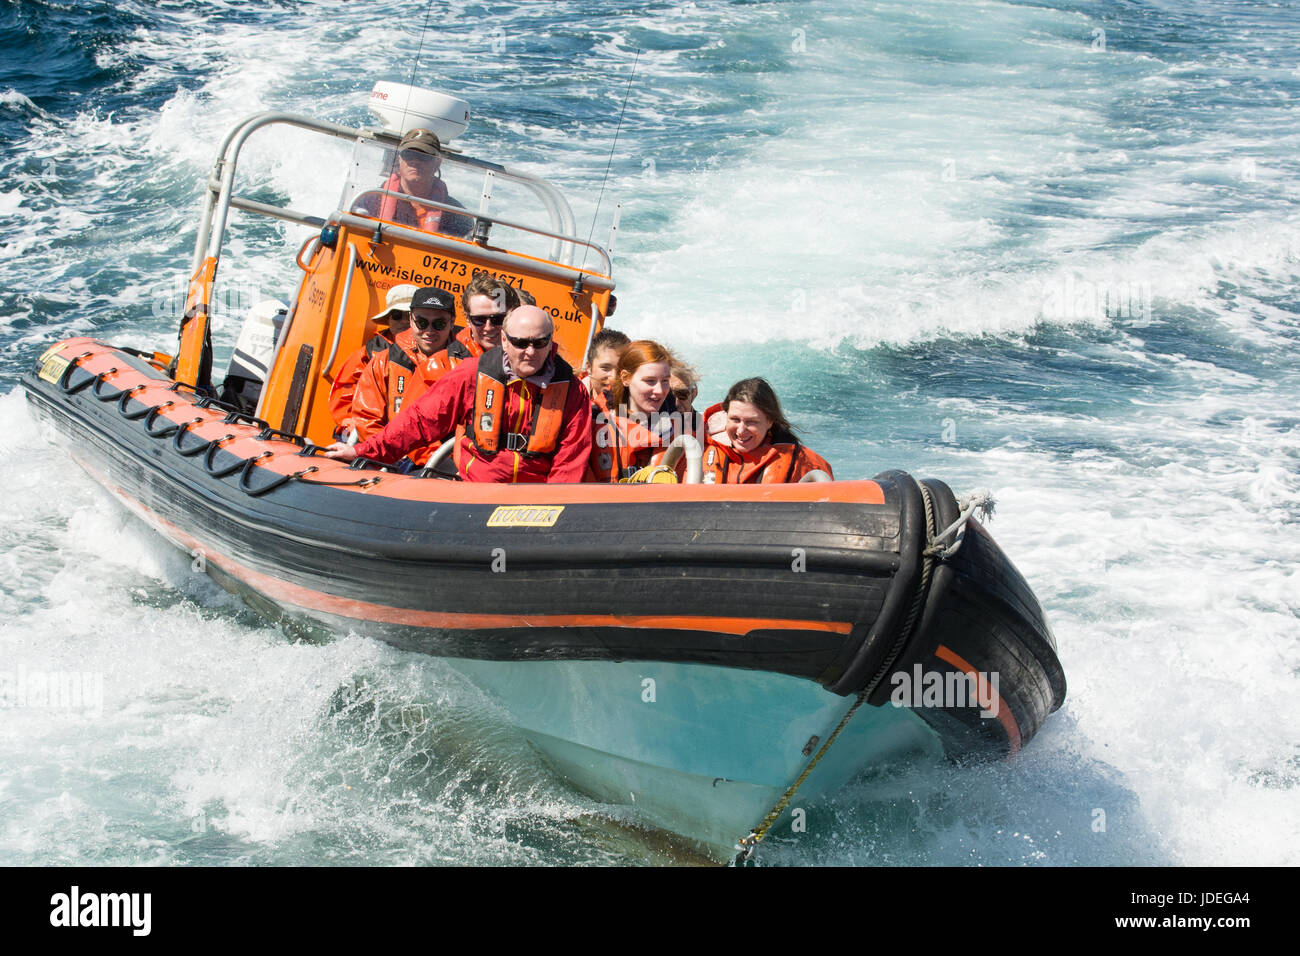 Anstruther viaje en barco inflable de casco rígido Osprey a la isla de Mayo, Anstruther, East Neuk de Fife, Imagen De Stock